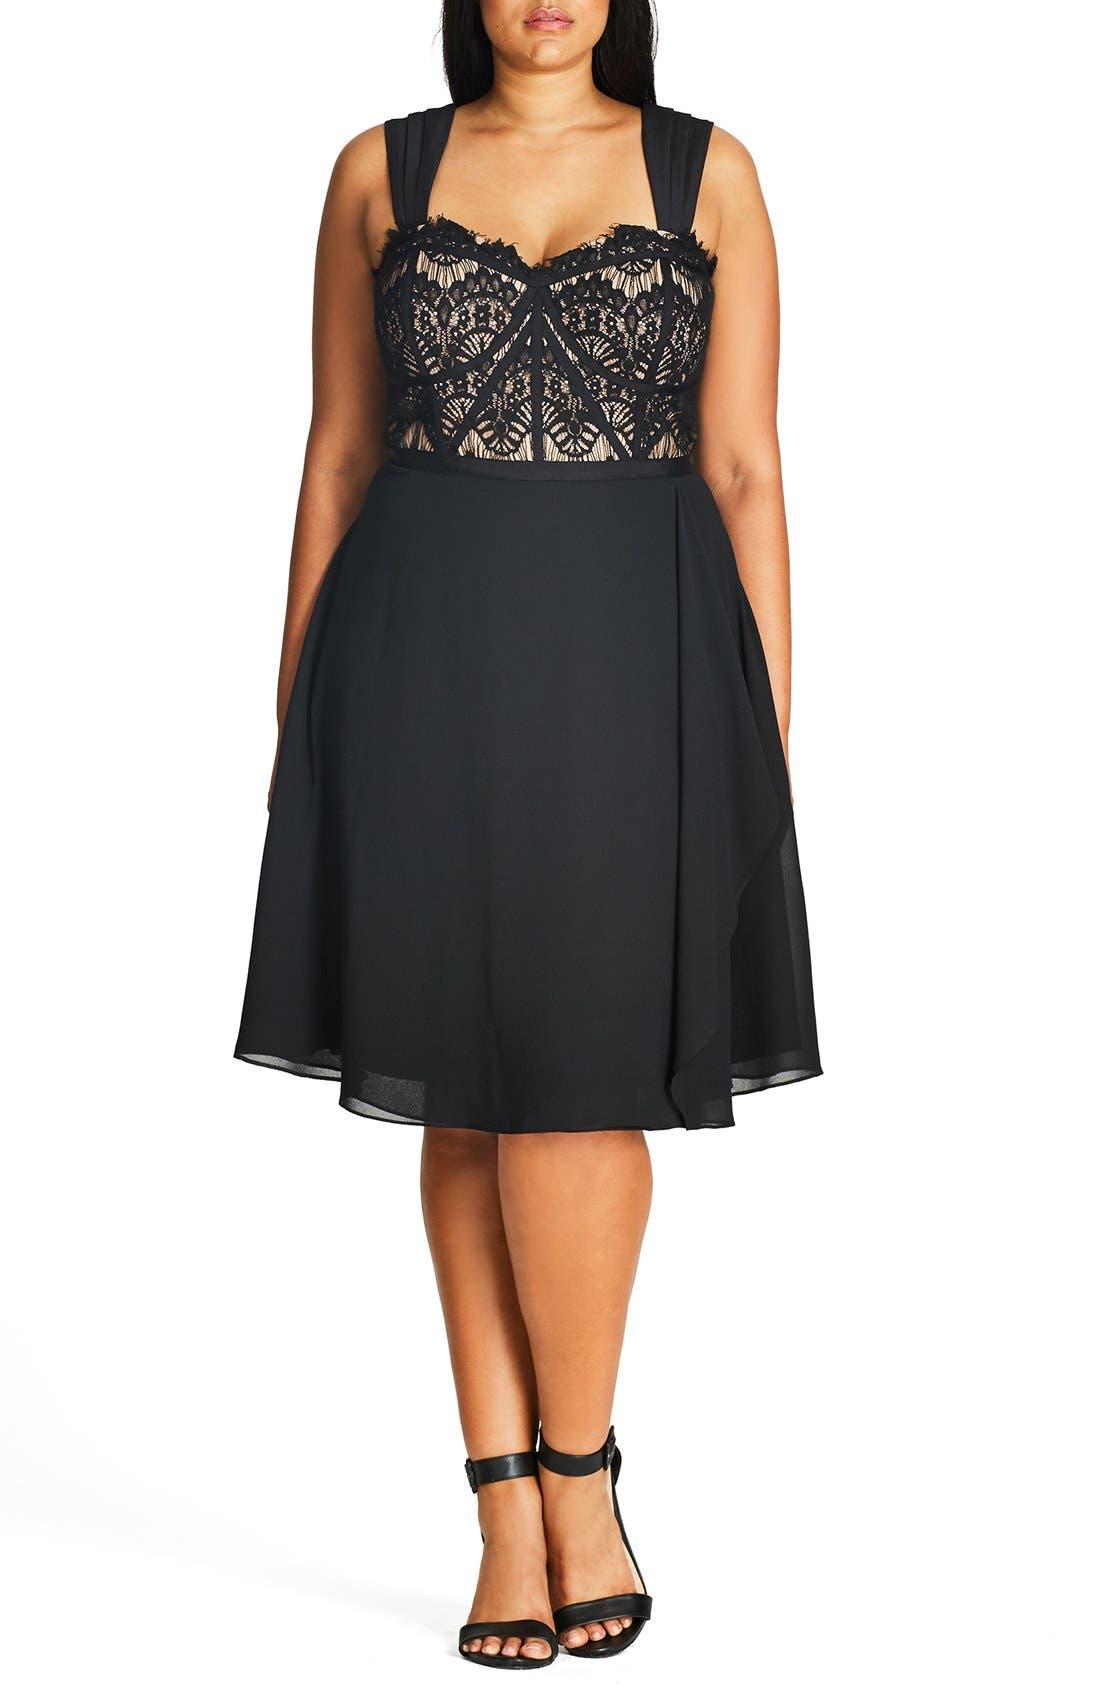 City Chic 'Eyelash Evie' Lace & Chiffon Cocktail Dress (Plus Size)